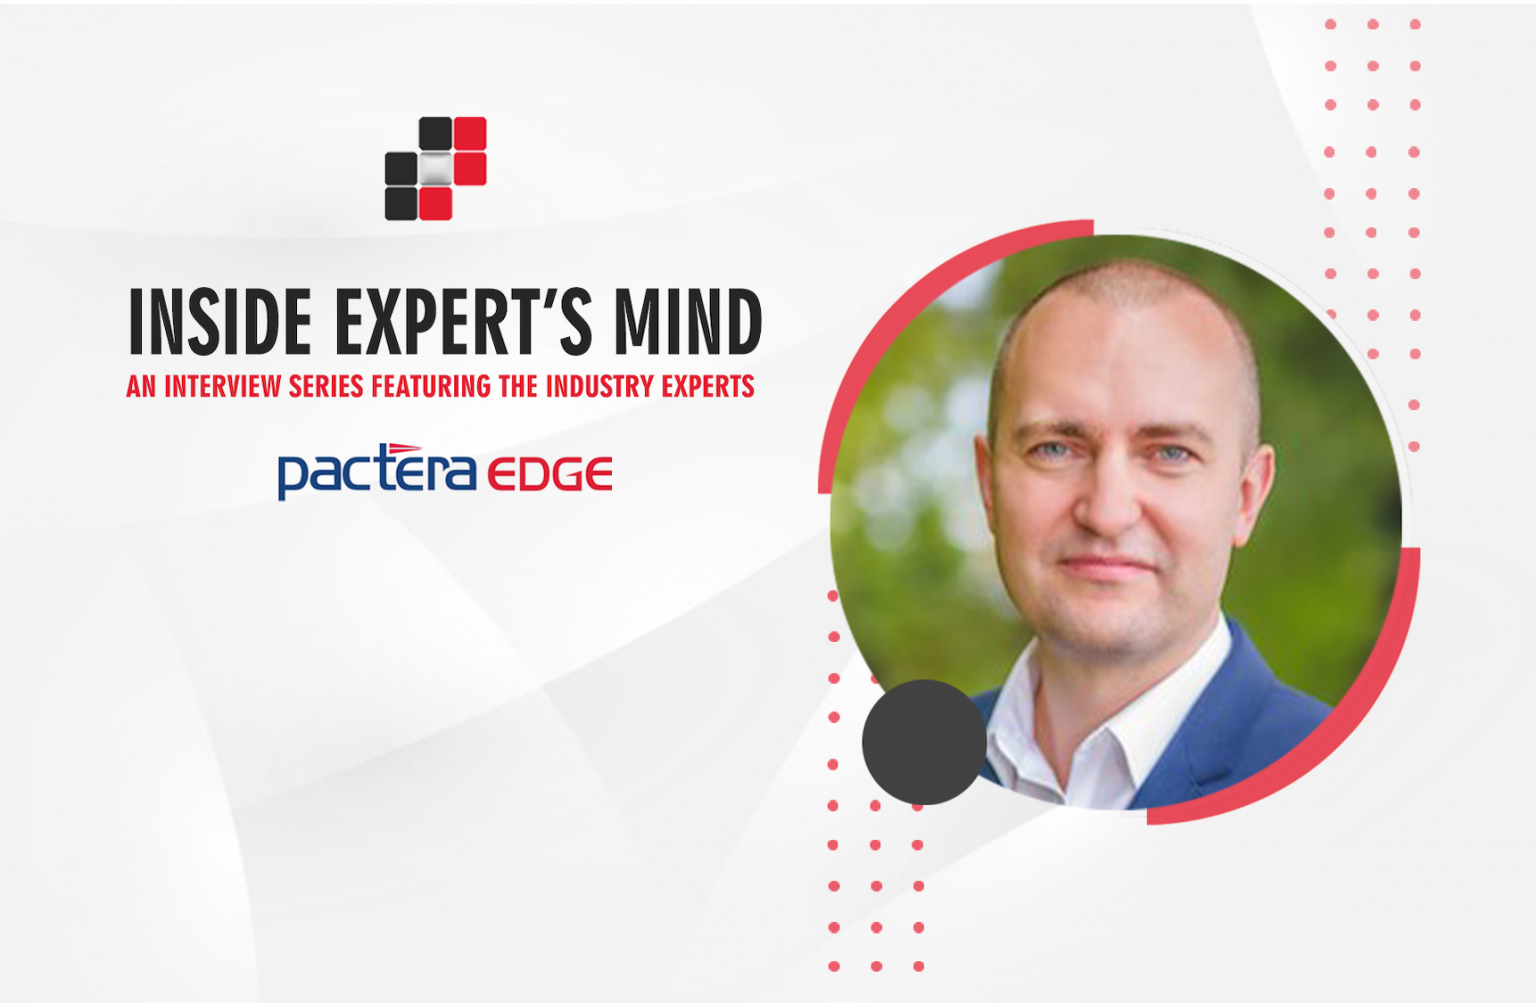 Jonas Ryberg, Senior Vice President, Chief Globalization Officer at Pactera EDGE